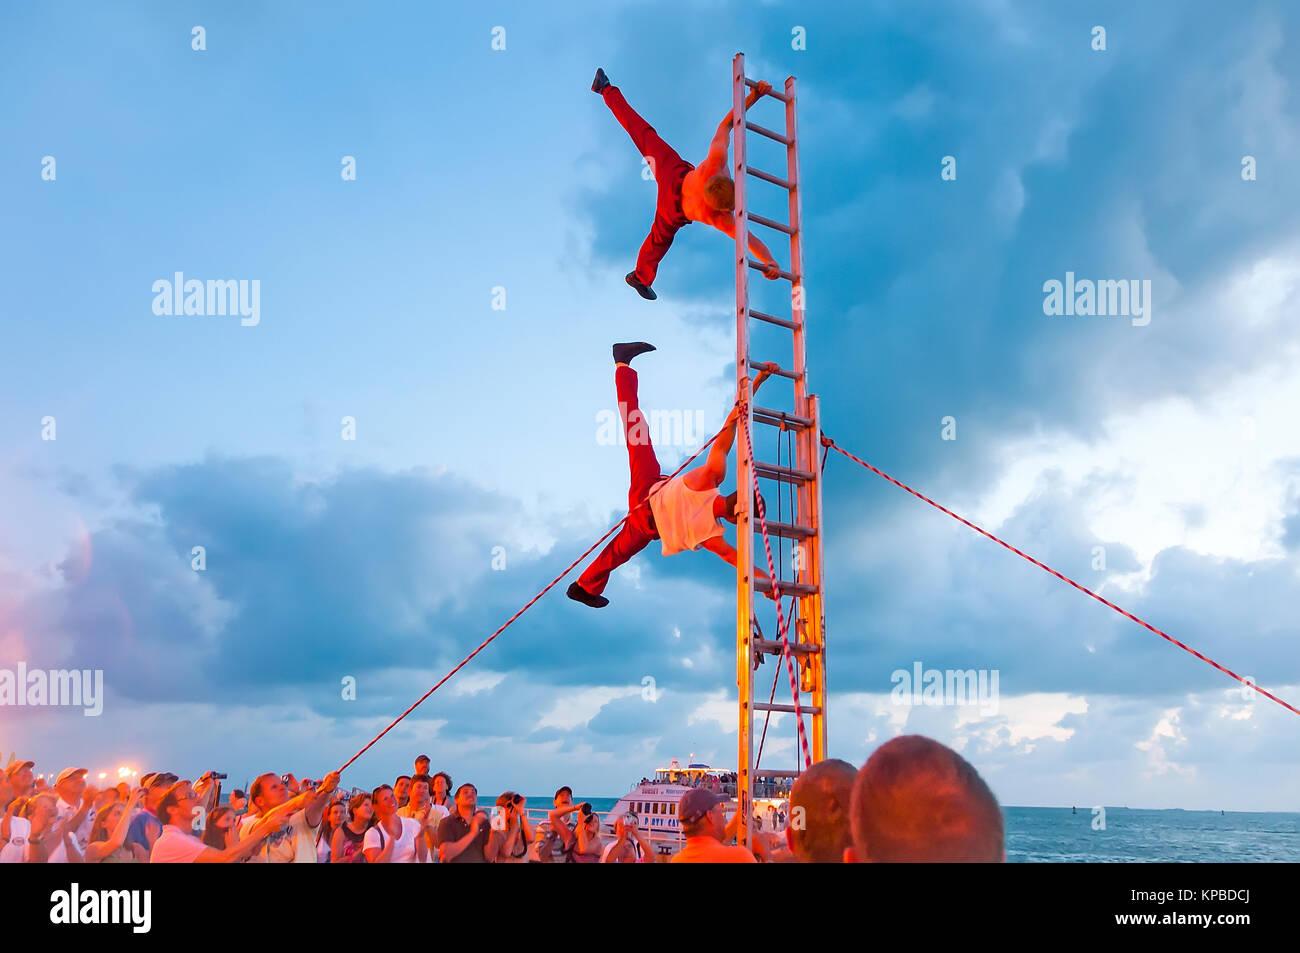 Acrobats on ladder perform vertical stand at Sunset Celebration Key West Florida - Stock Image